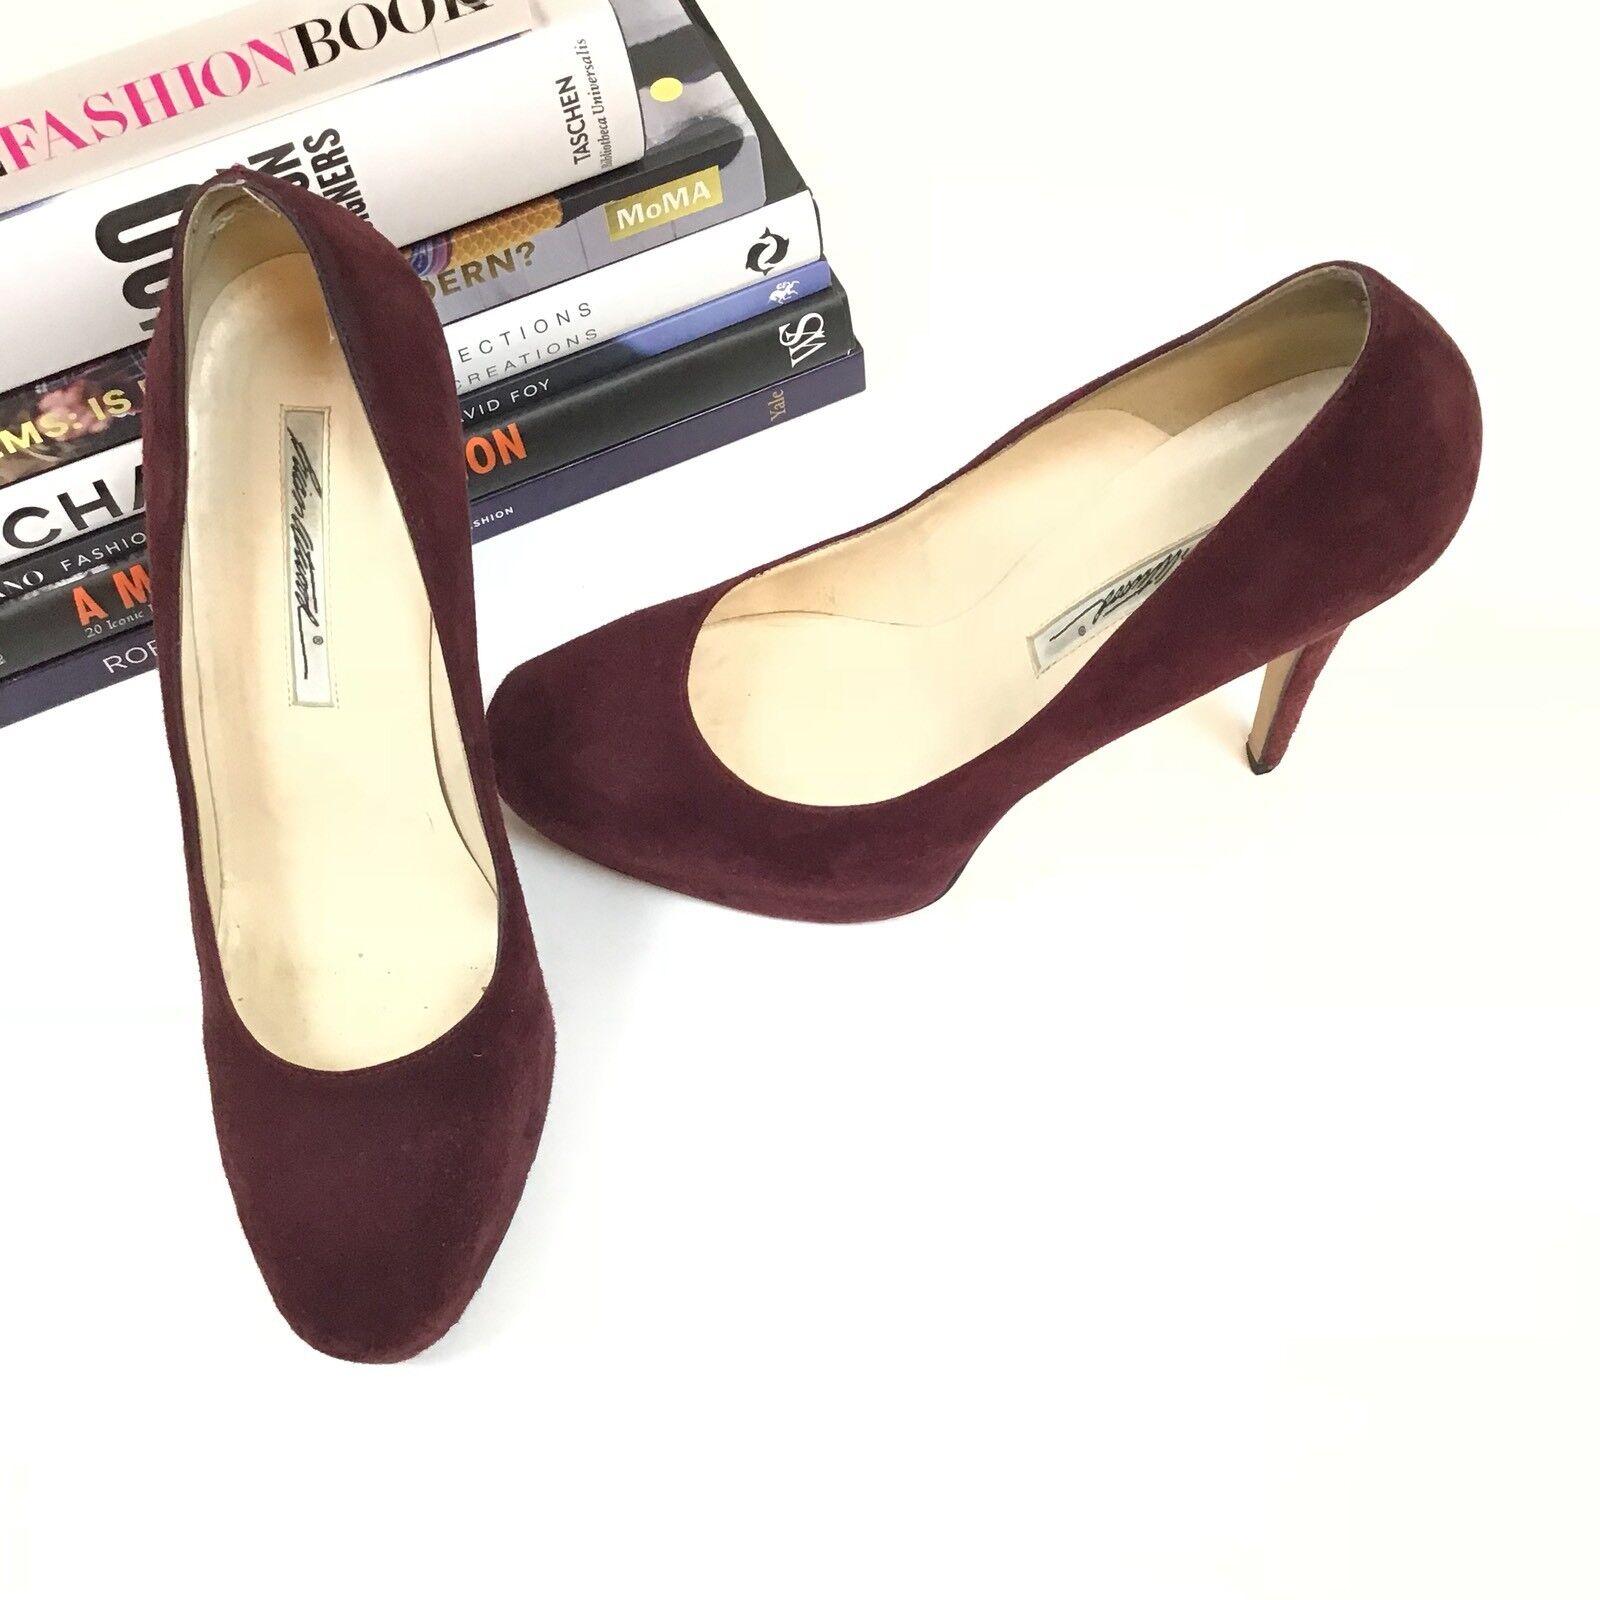 Brian Atwood Heels 39 Maroon Wine Red Suede Platform Pumps Women's shoes